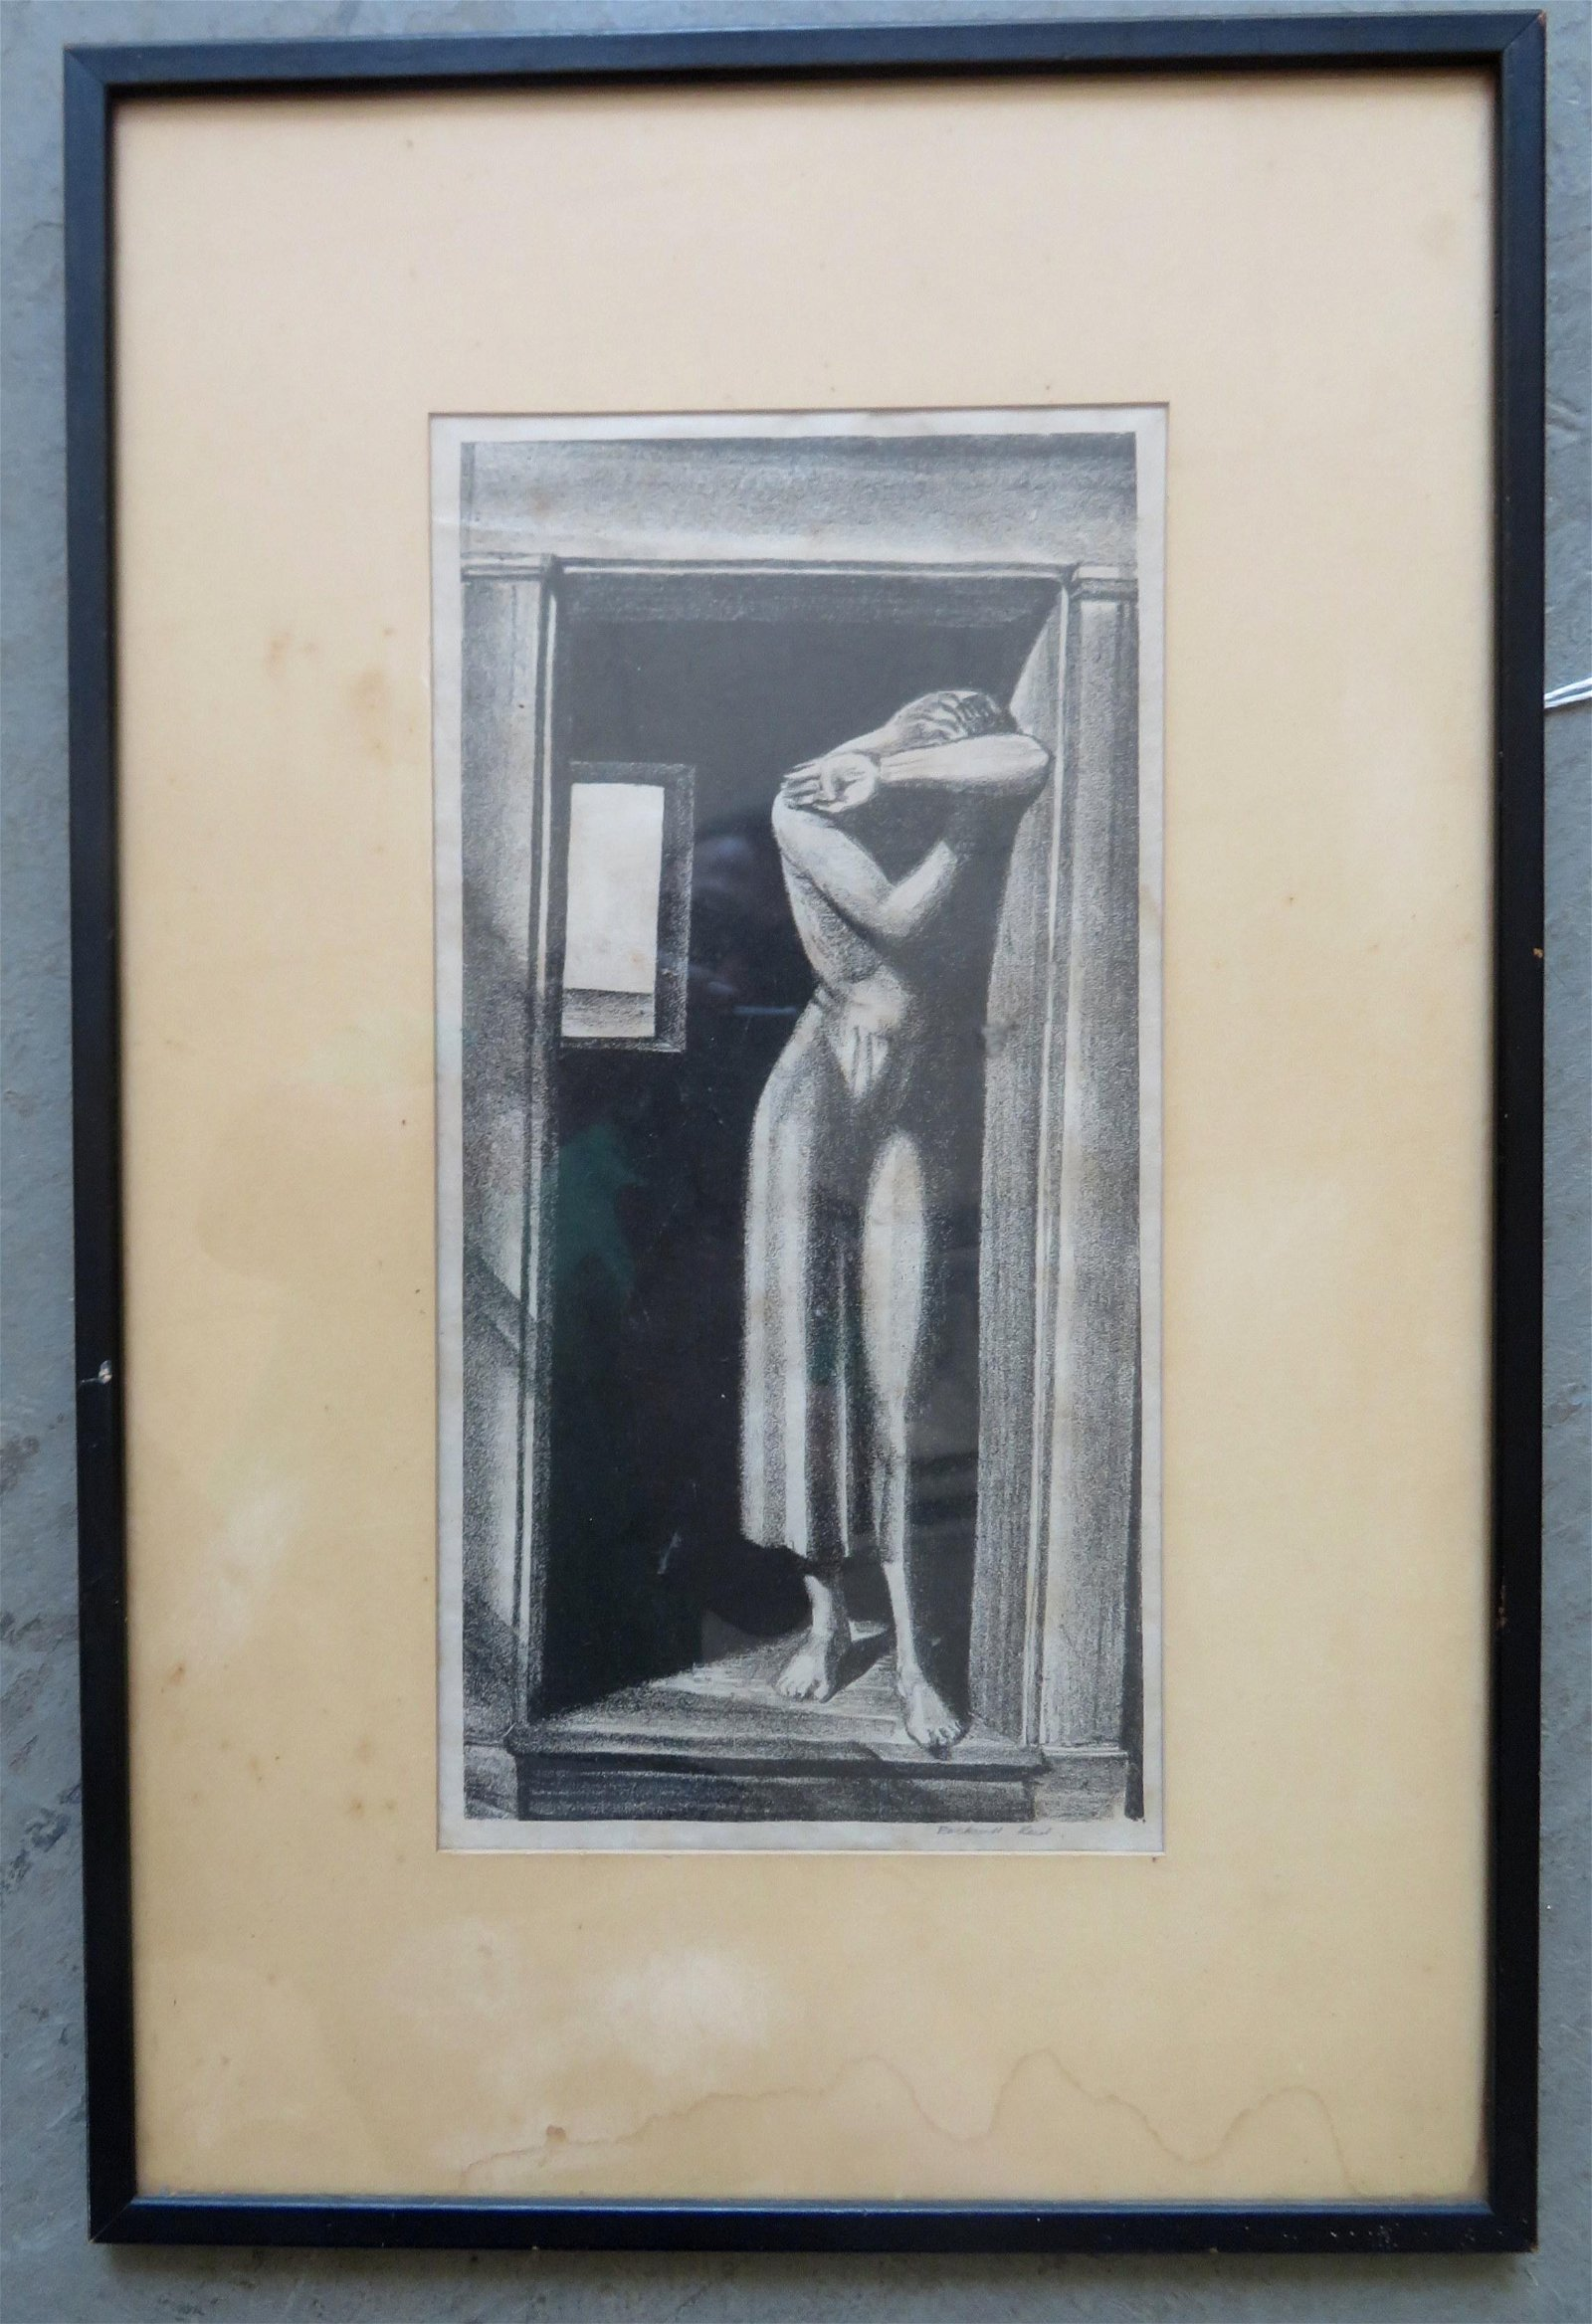 Rockwell Kent (New York, 1882-1971), entitled